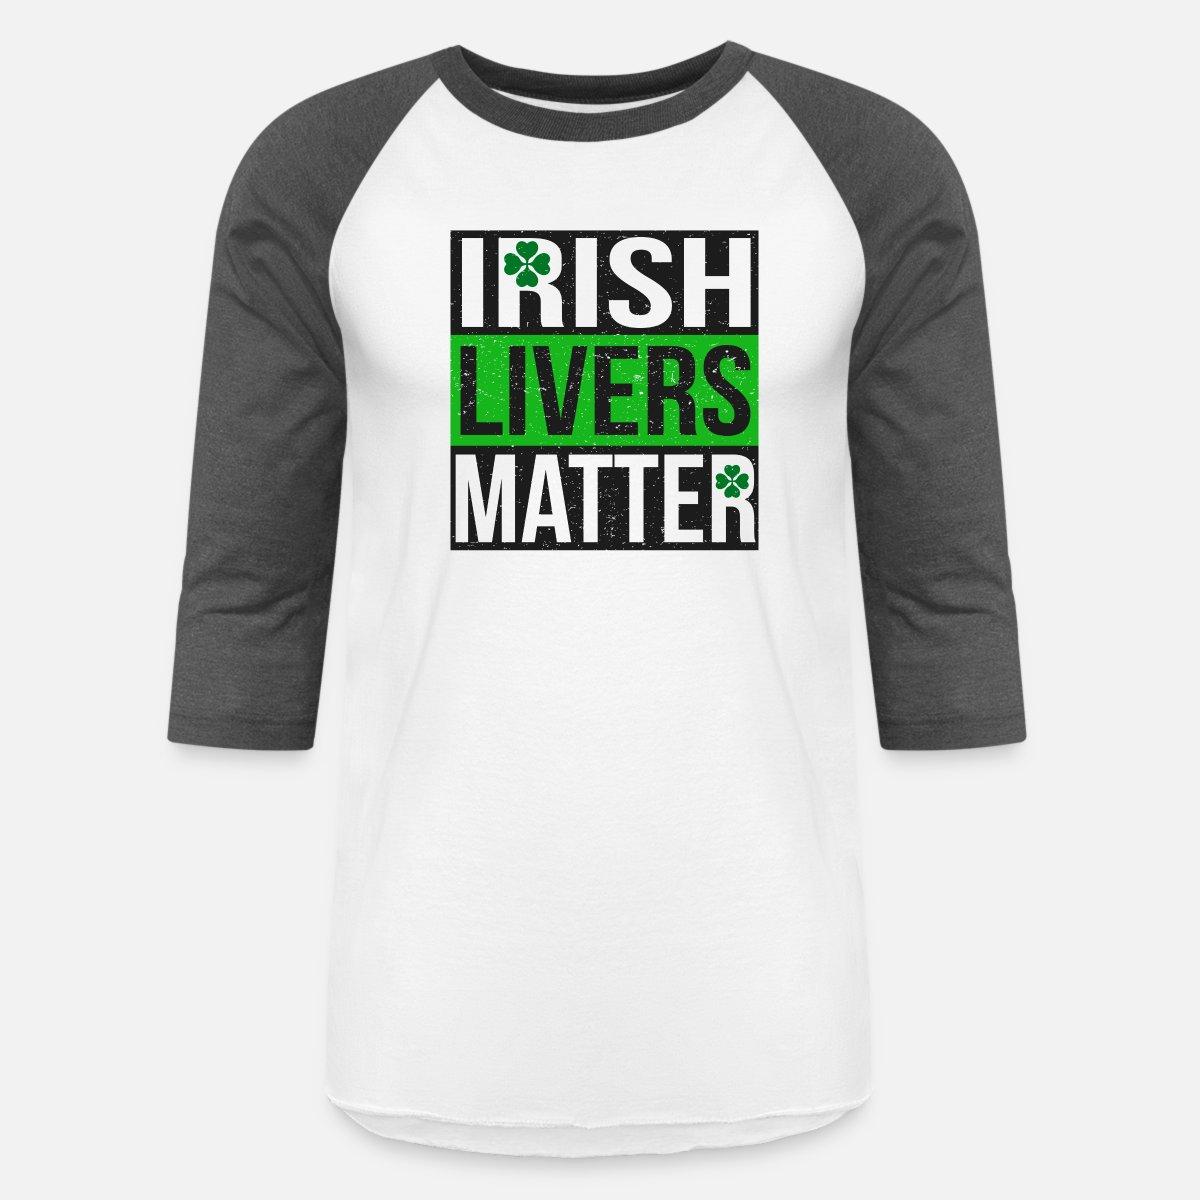 38362dec Irish Livers Matter - Funny St Patricks Day Shirt Unisex Baseball T-Shirt |  Spreadshirt